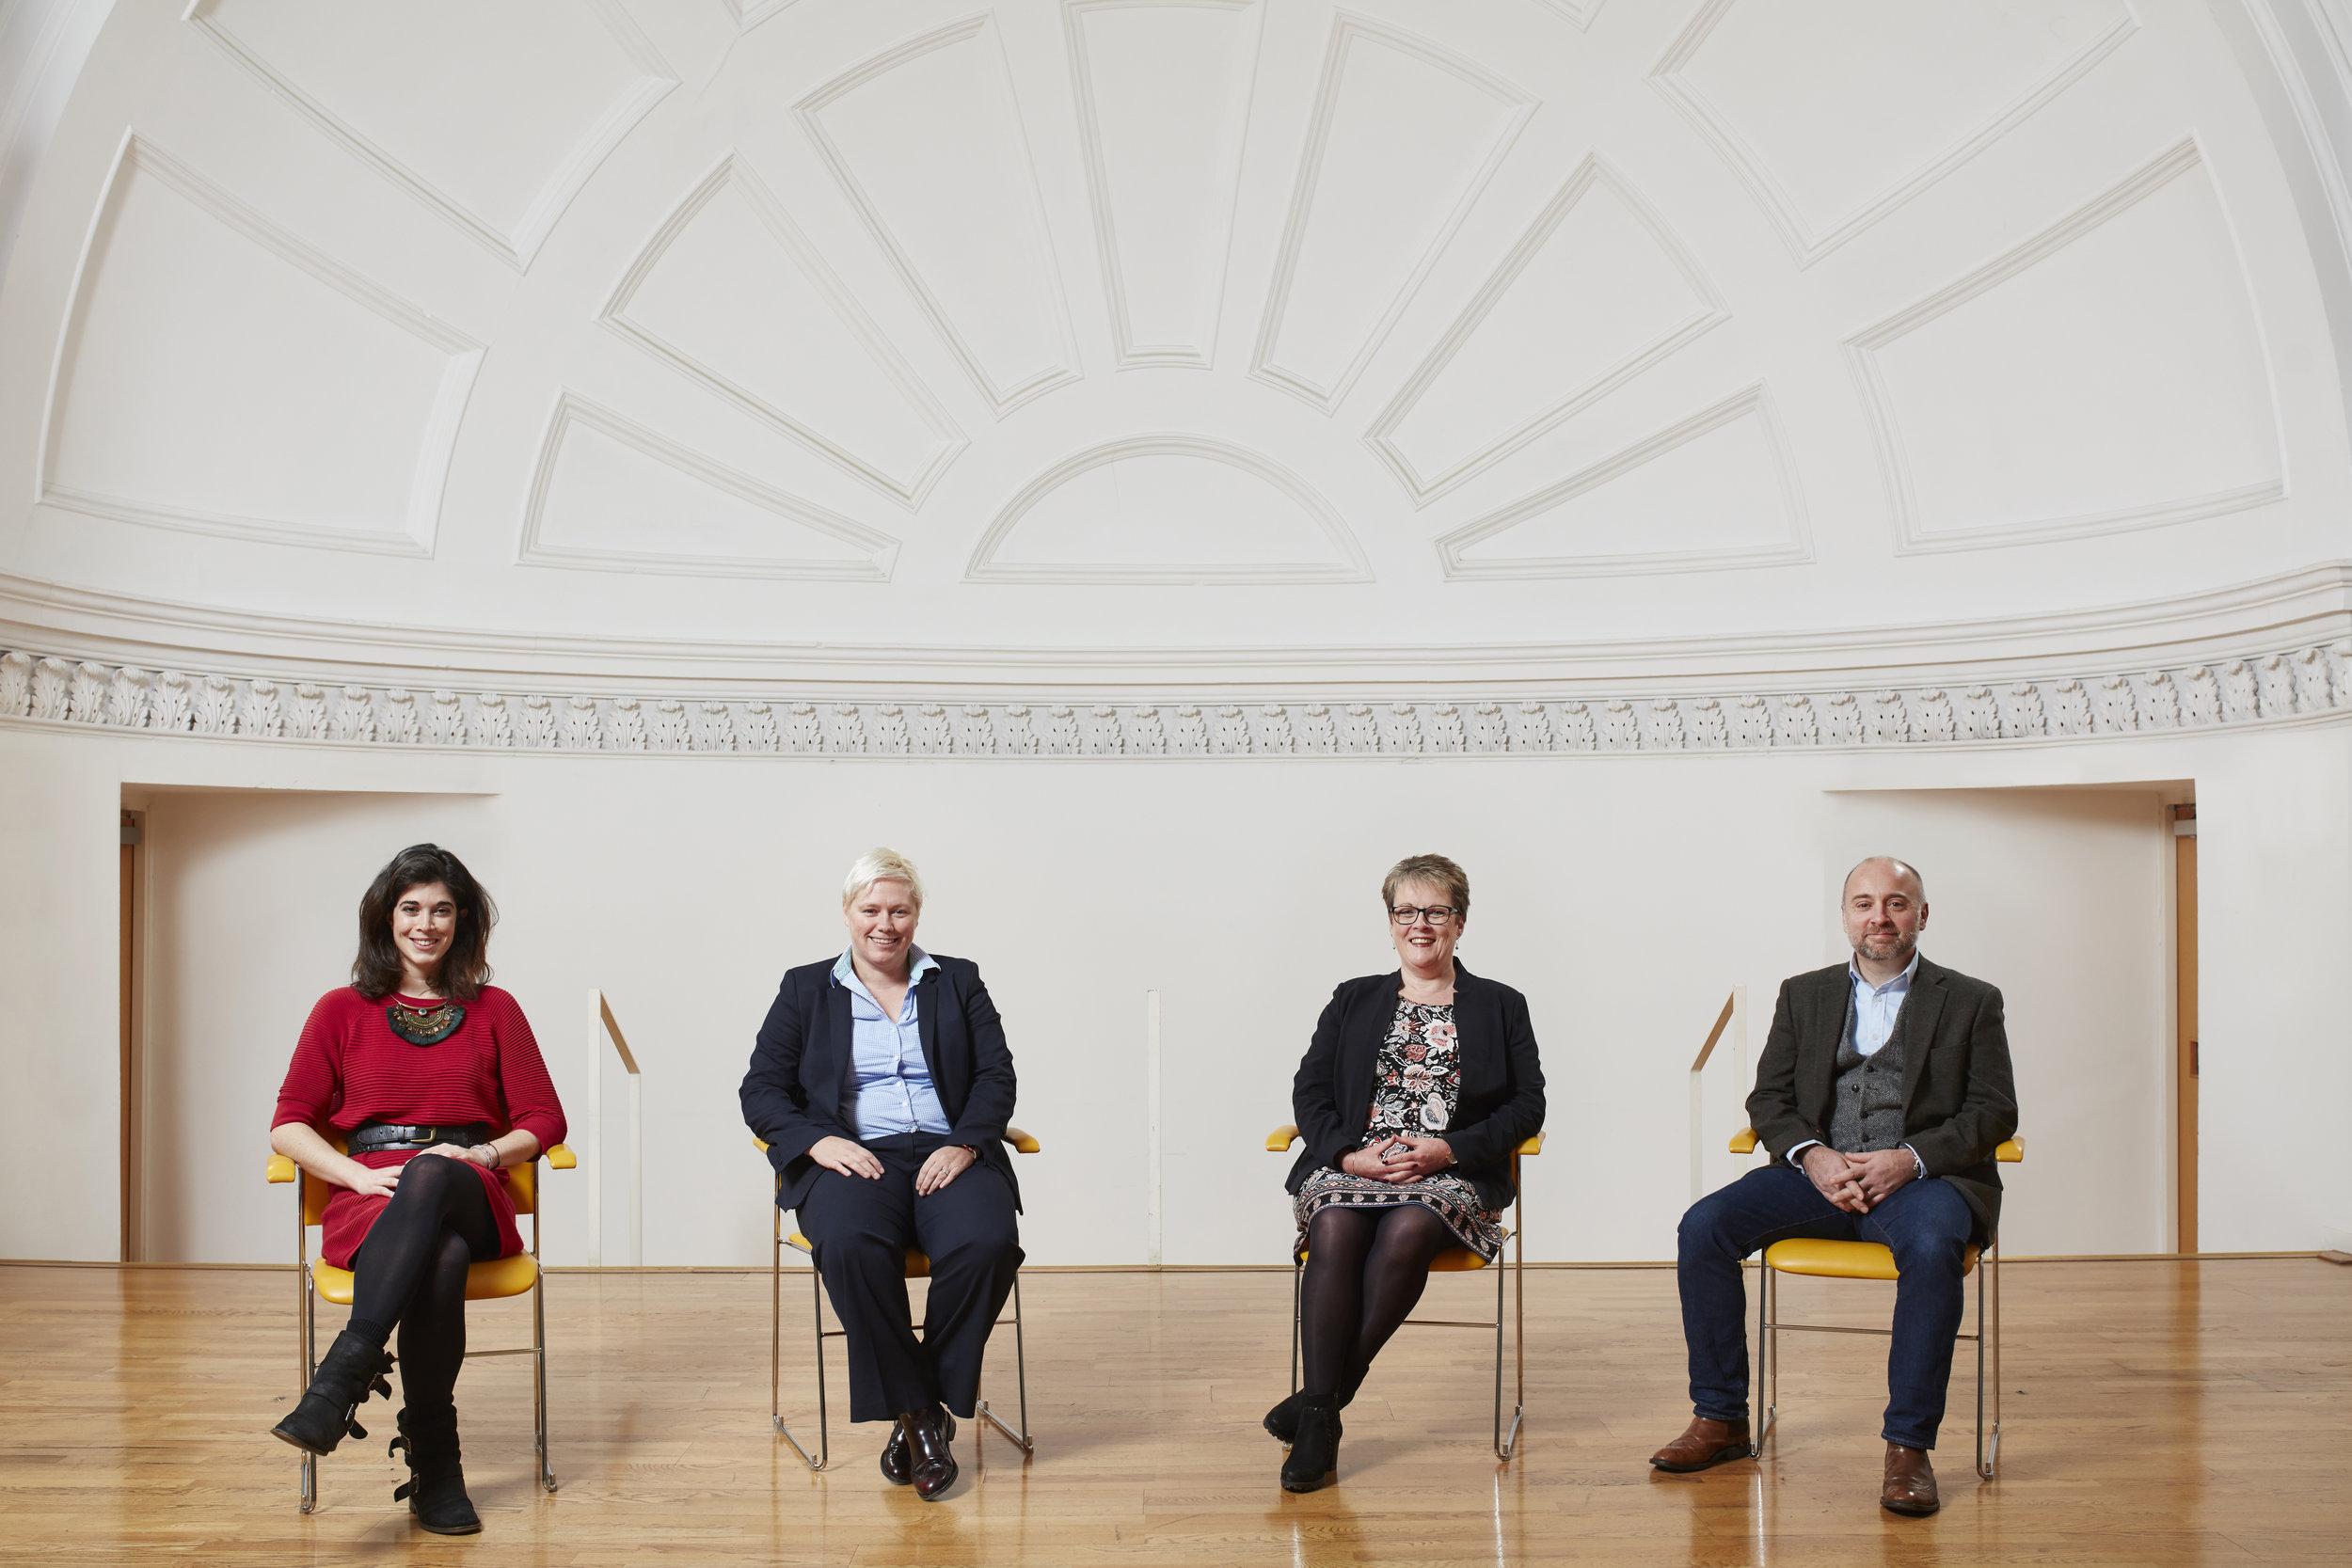 From l-r: Laurene de Peyrelongue, Merkle Aquila; Gillian Docherty, The Data Lab;Carol Sinclair, NHS NSS;Hugo D'Ulisse, SAS.